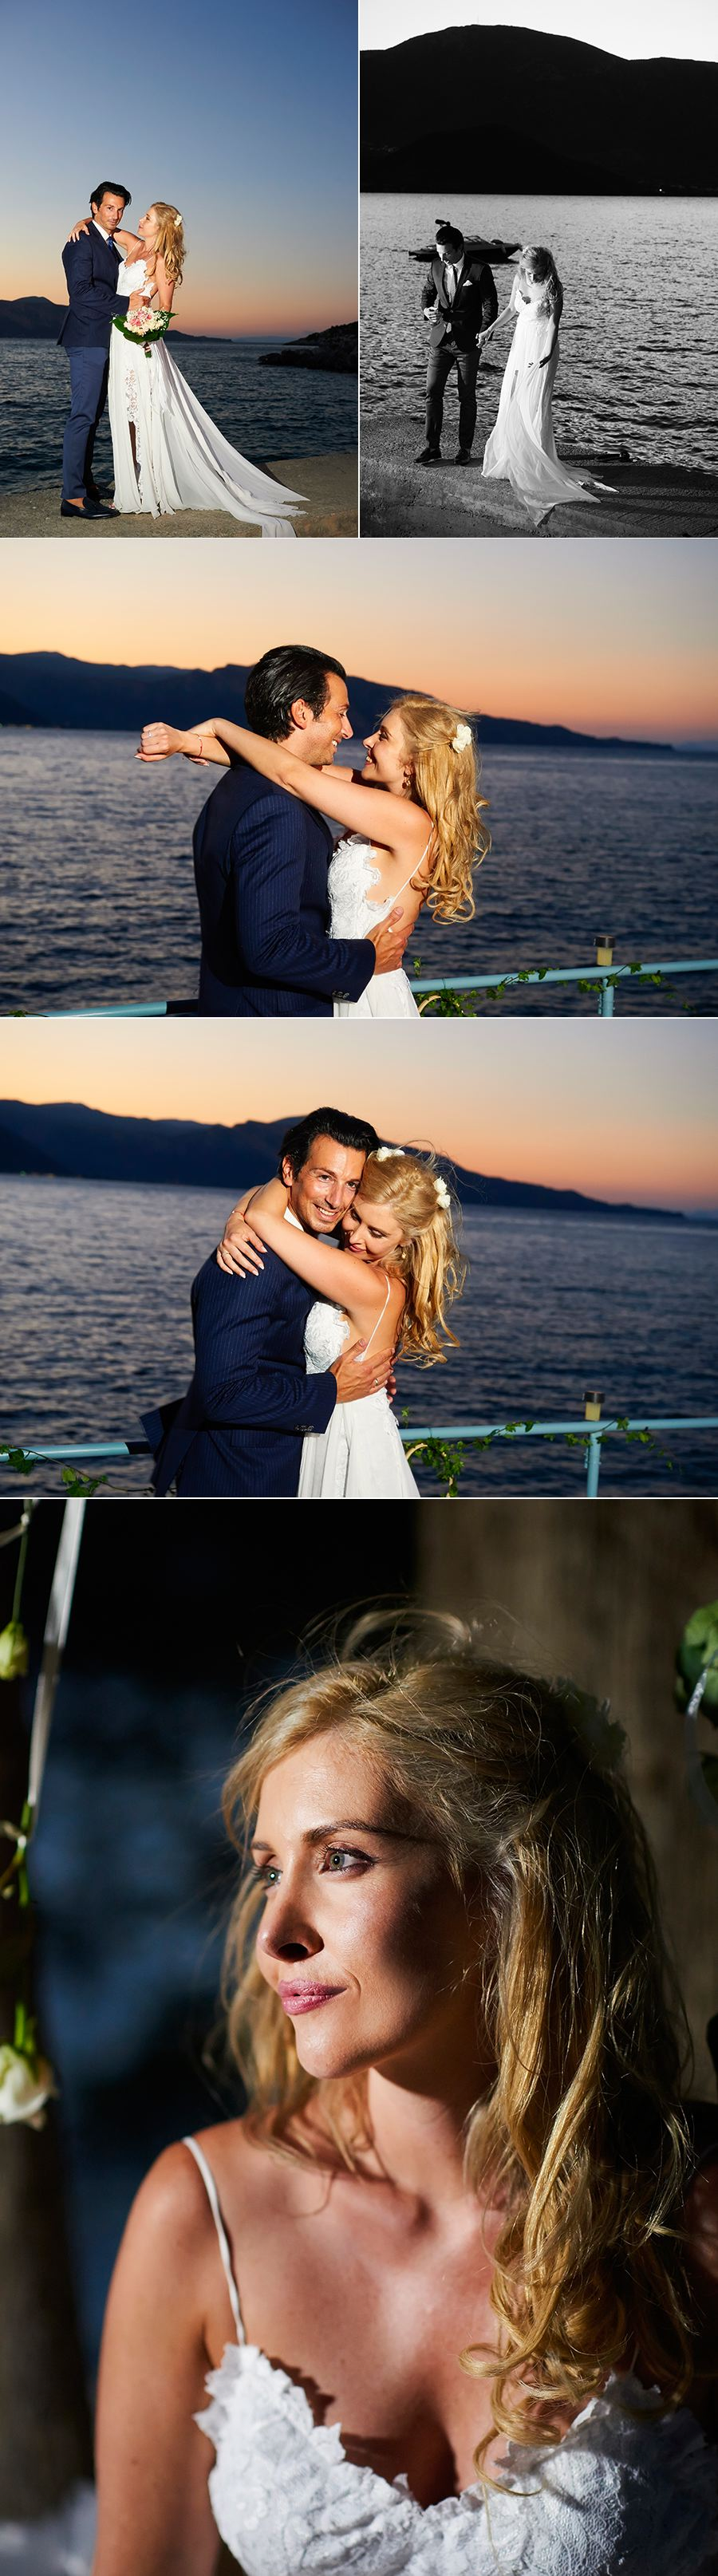 giannis-stella-wedding-photo-12